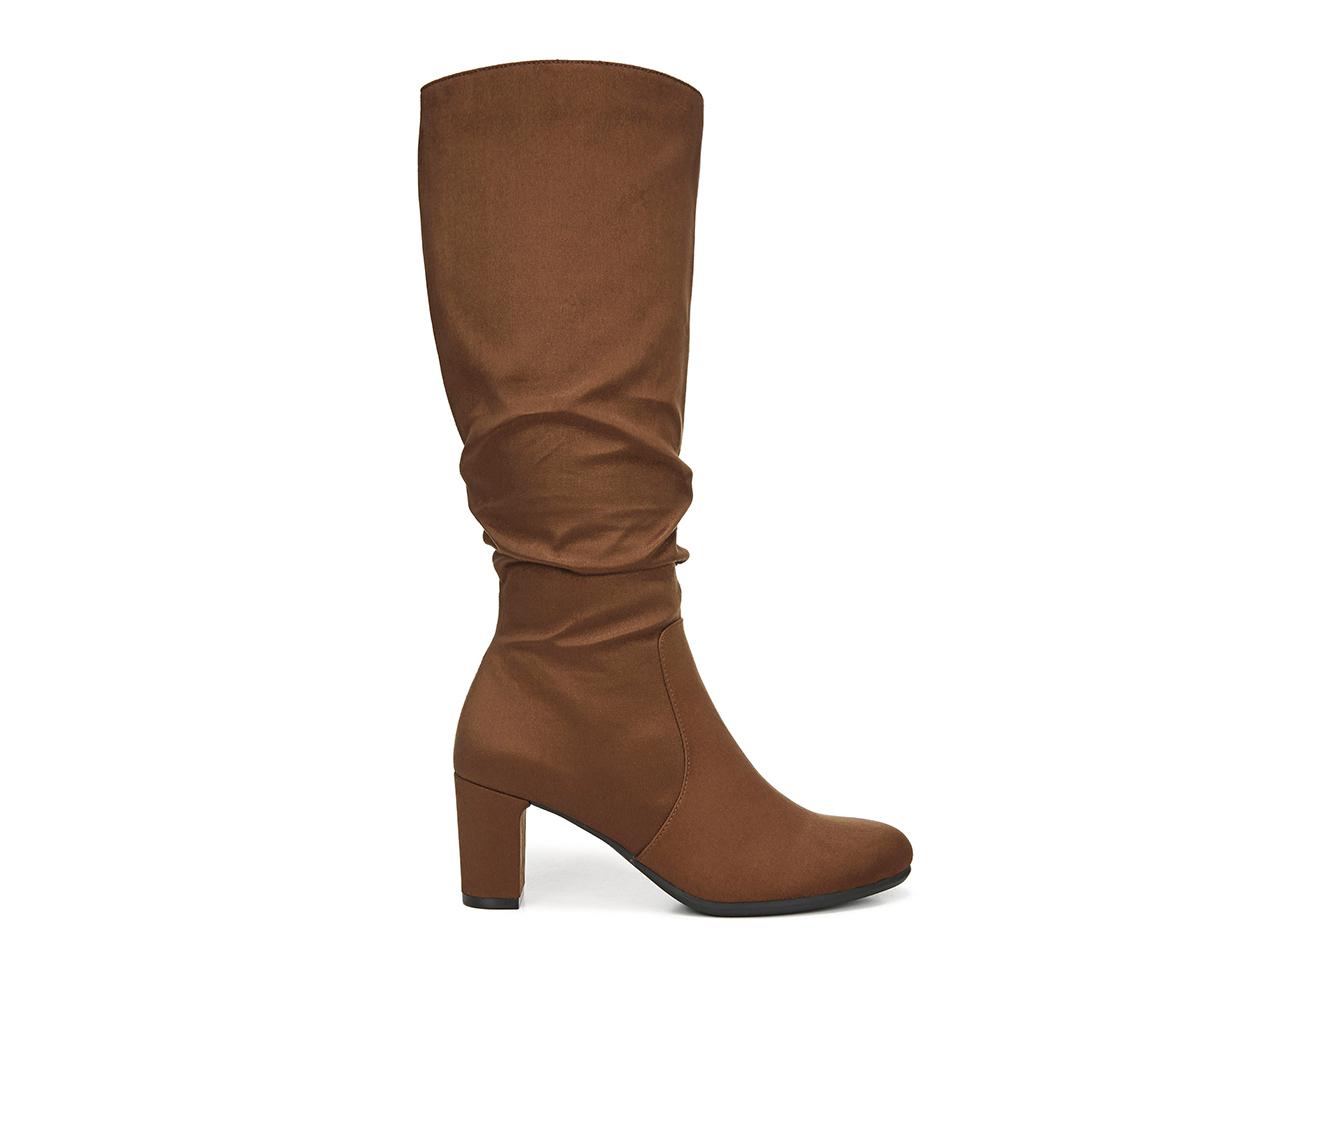 LifeStride Maltese Women's Boots (Brown - Canvas)